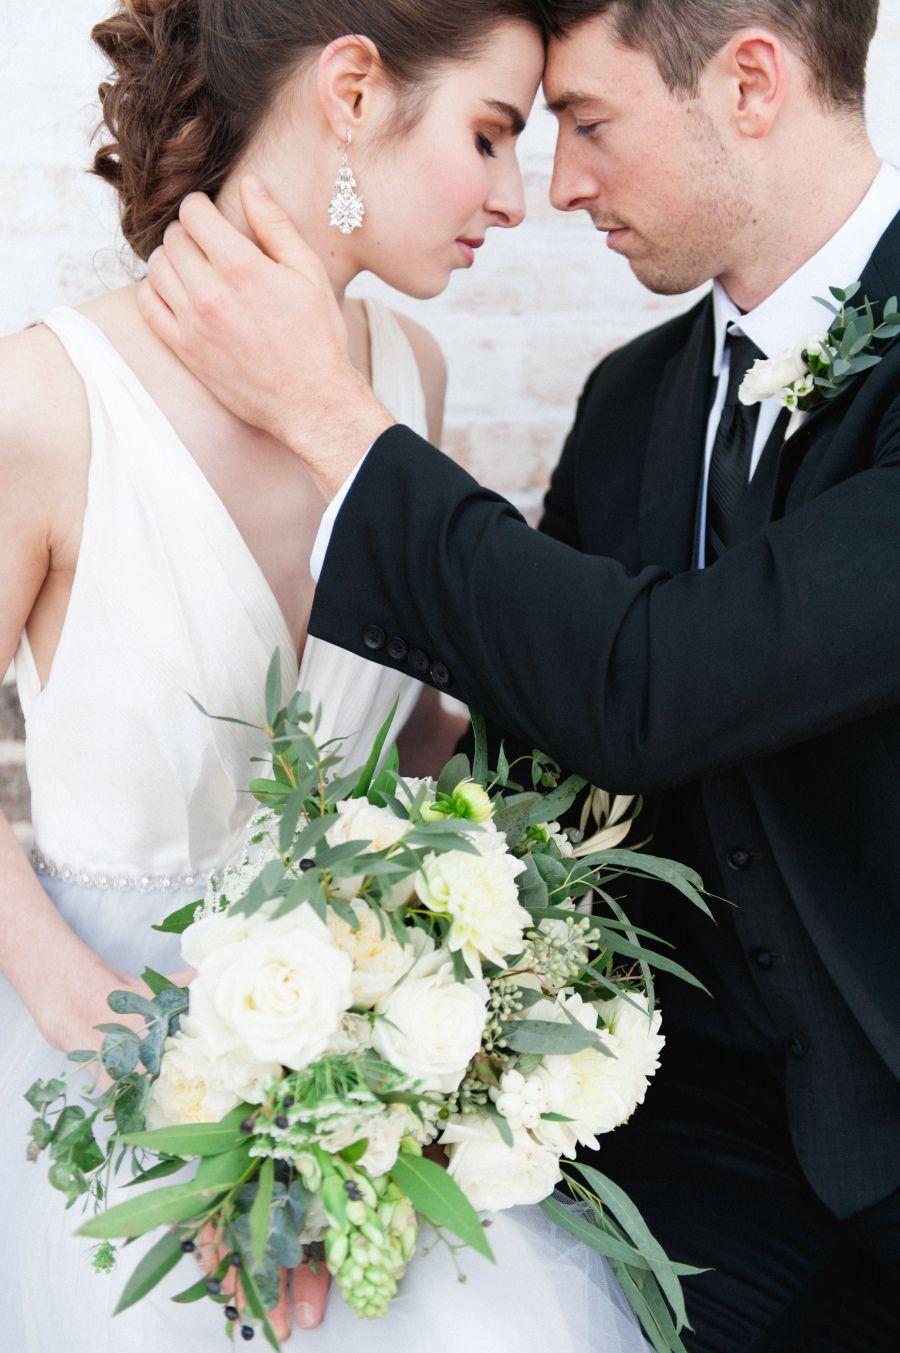 Photography : Roots Of Life Photography | Wedding Dress : Alyssa Kristin Bridal  | Venue : Villa Terrace Decorative Arts Museum | Floral Design : May Floral  | Coordinator : Heirloom Event Co | Wedding Dress : Alyssa Kristin Read More on SMP: http://www.stylemepretty.com/wisconsin-weddings/milwaukee/2016/01/18/elegant-european-villa-wedding-inspiration/